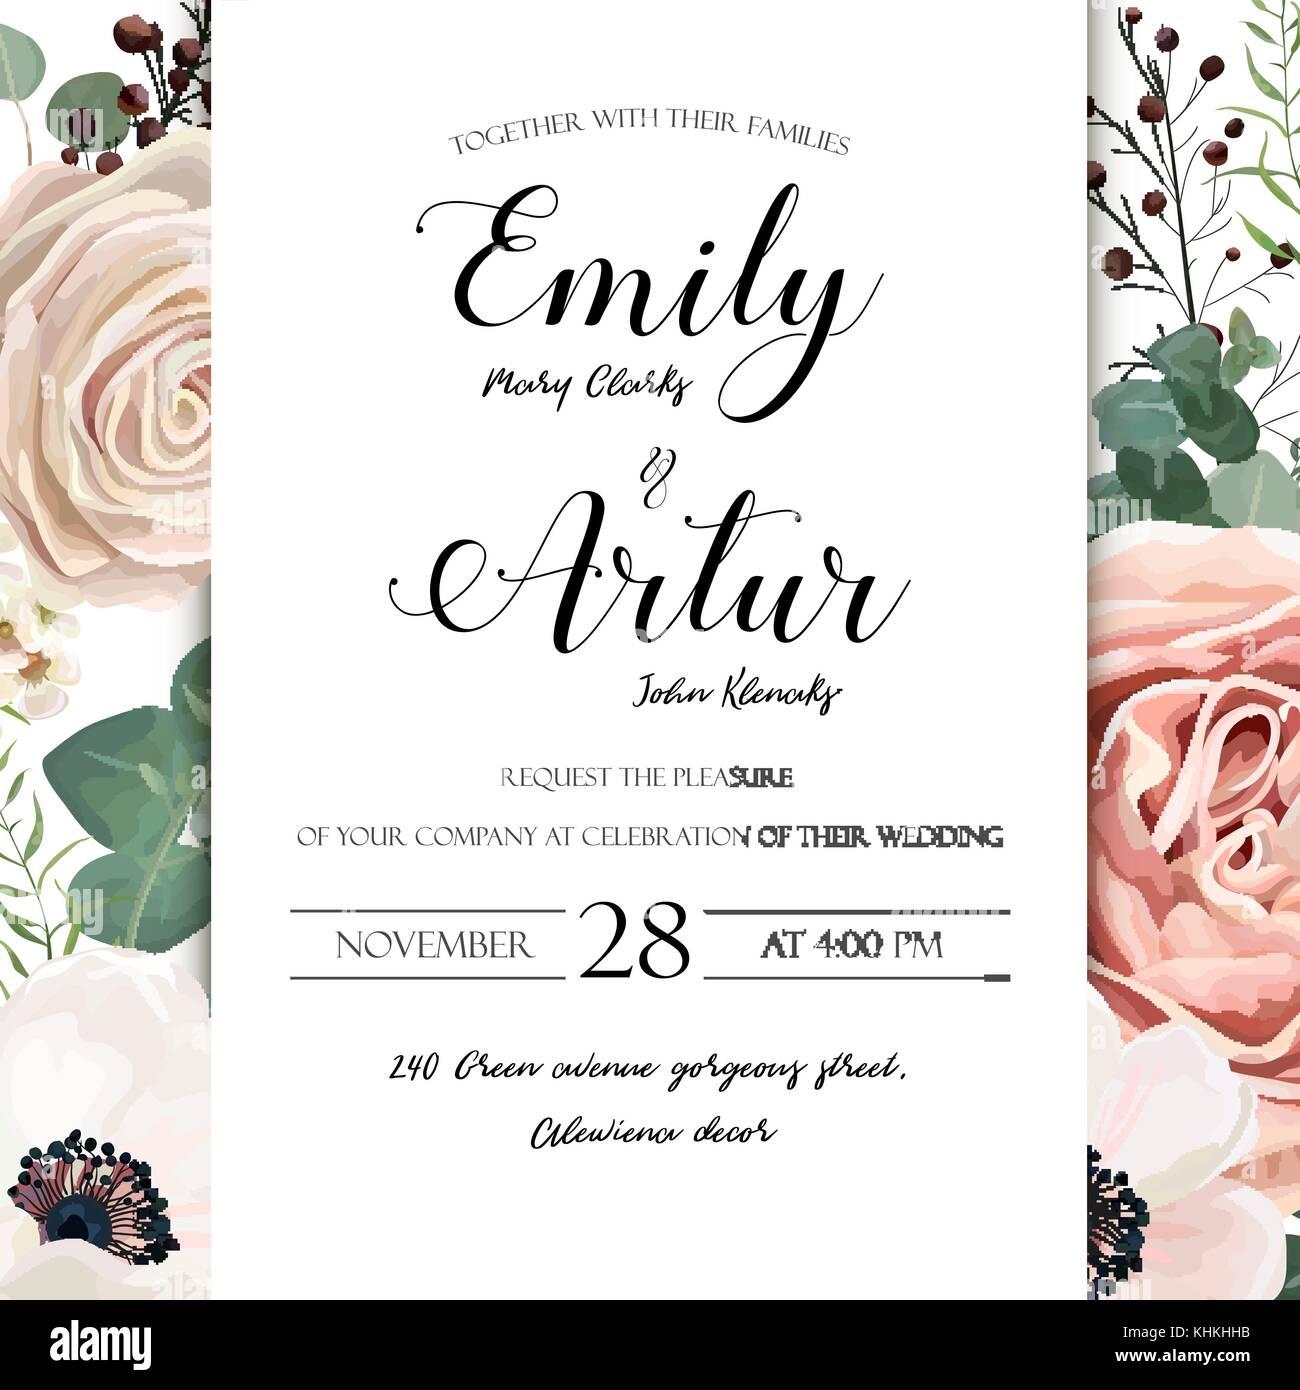 floral wedding invitation elegant invite card vector design garden